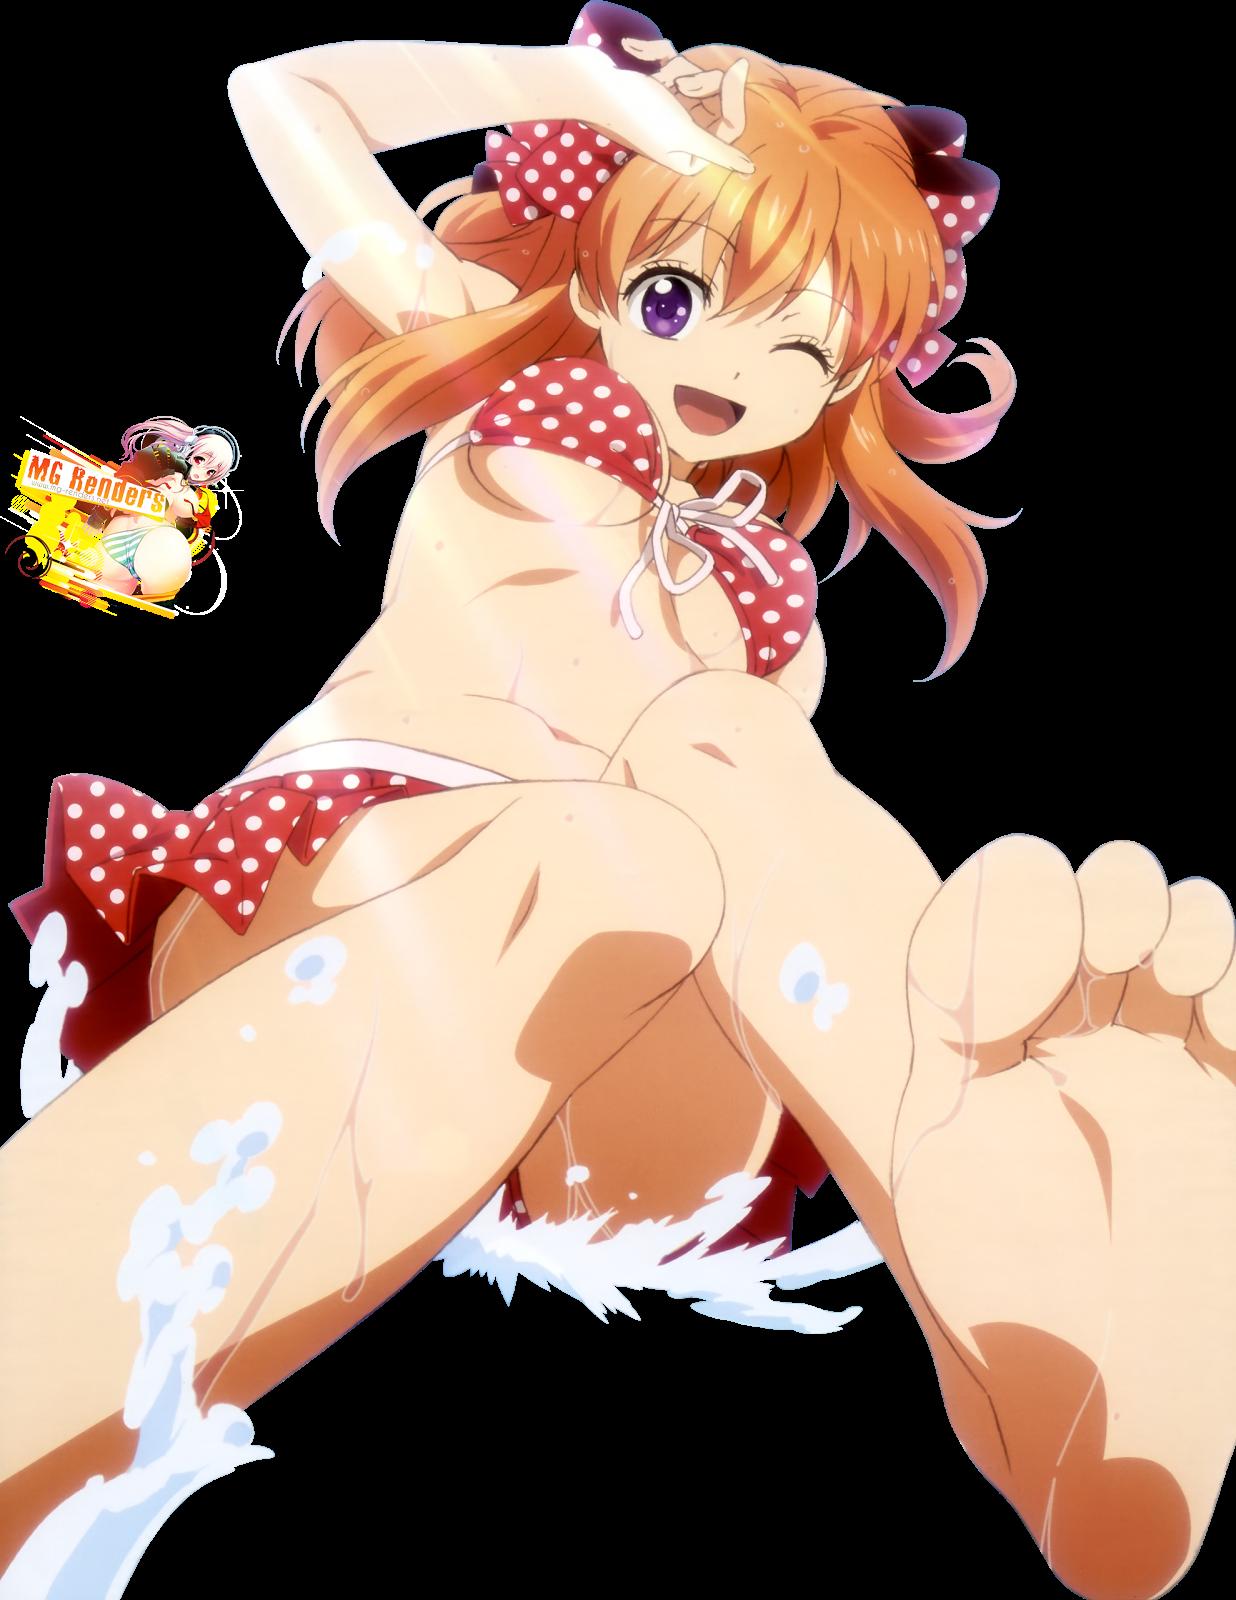 Tags: Anime, Render,  Feet,  Gekkan Shoujo Nozaki-kun,  Sakura Chiyo,  PNG, Image, Picture